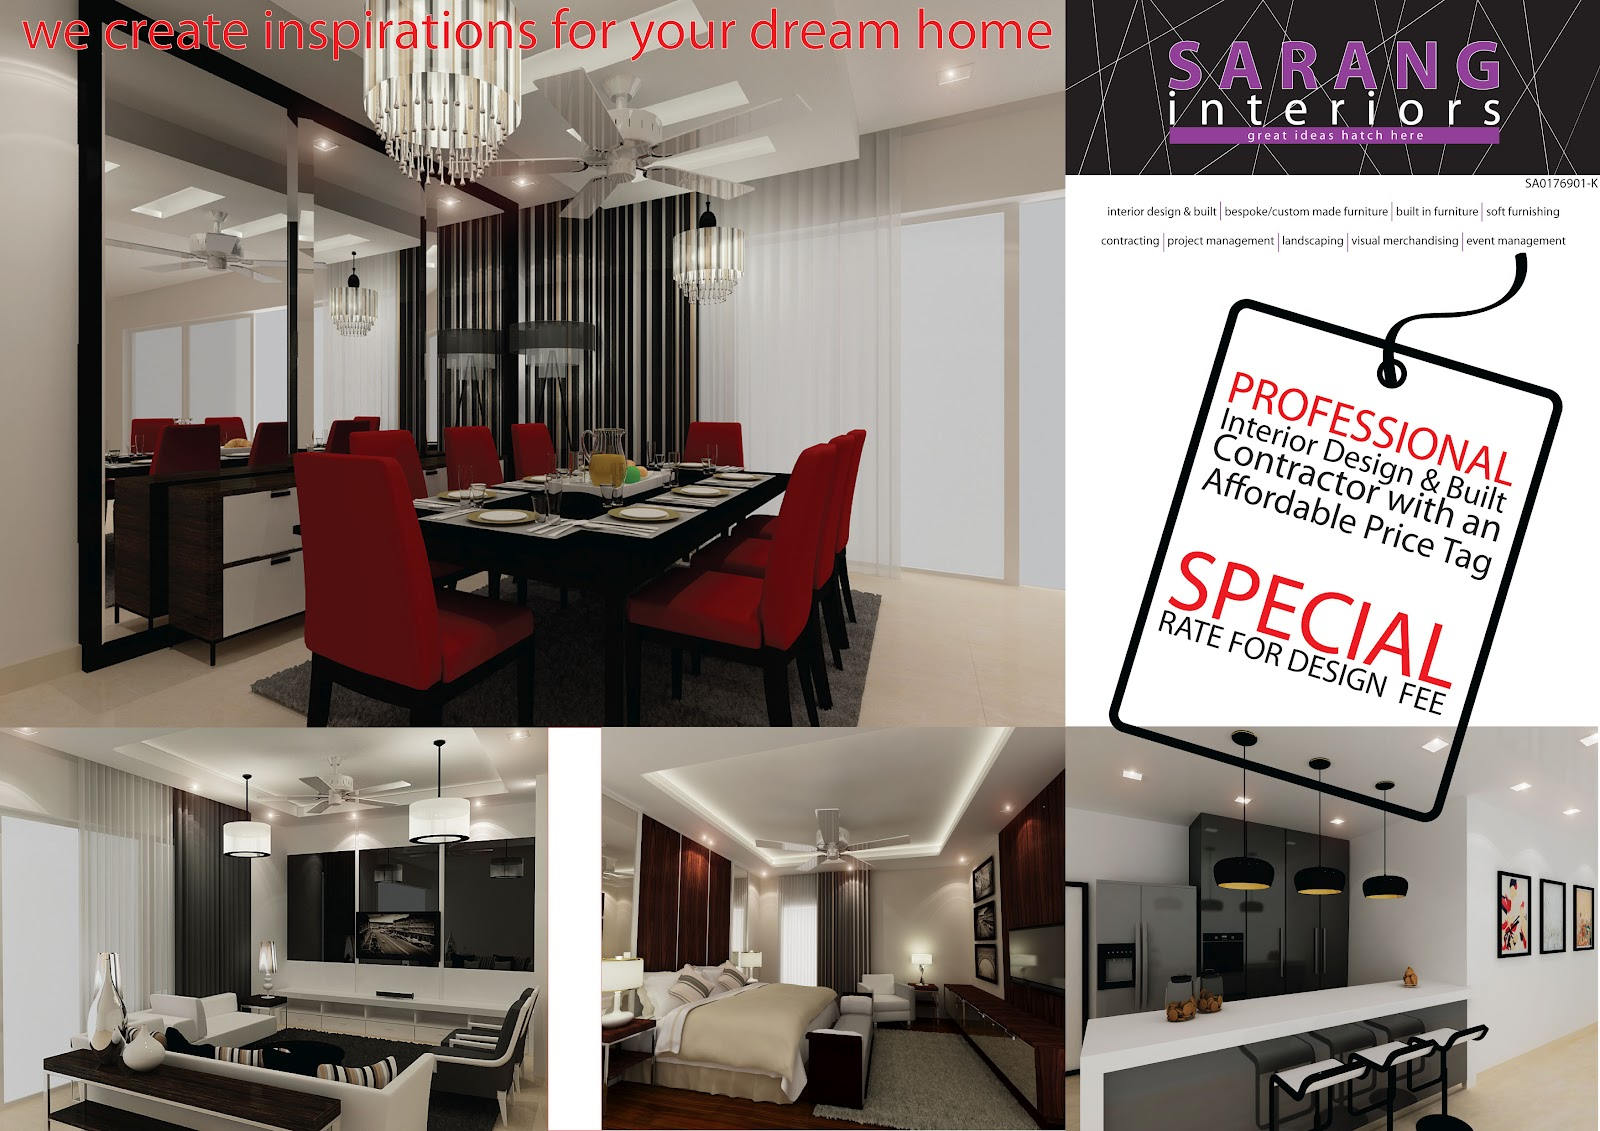 Sarang Interiors Modern Tropical Interior Design By: SARANG INTERIORS: SARANG INTERIORS ::Professional Interior